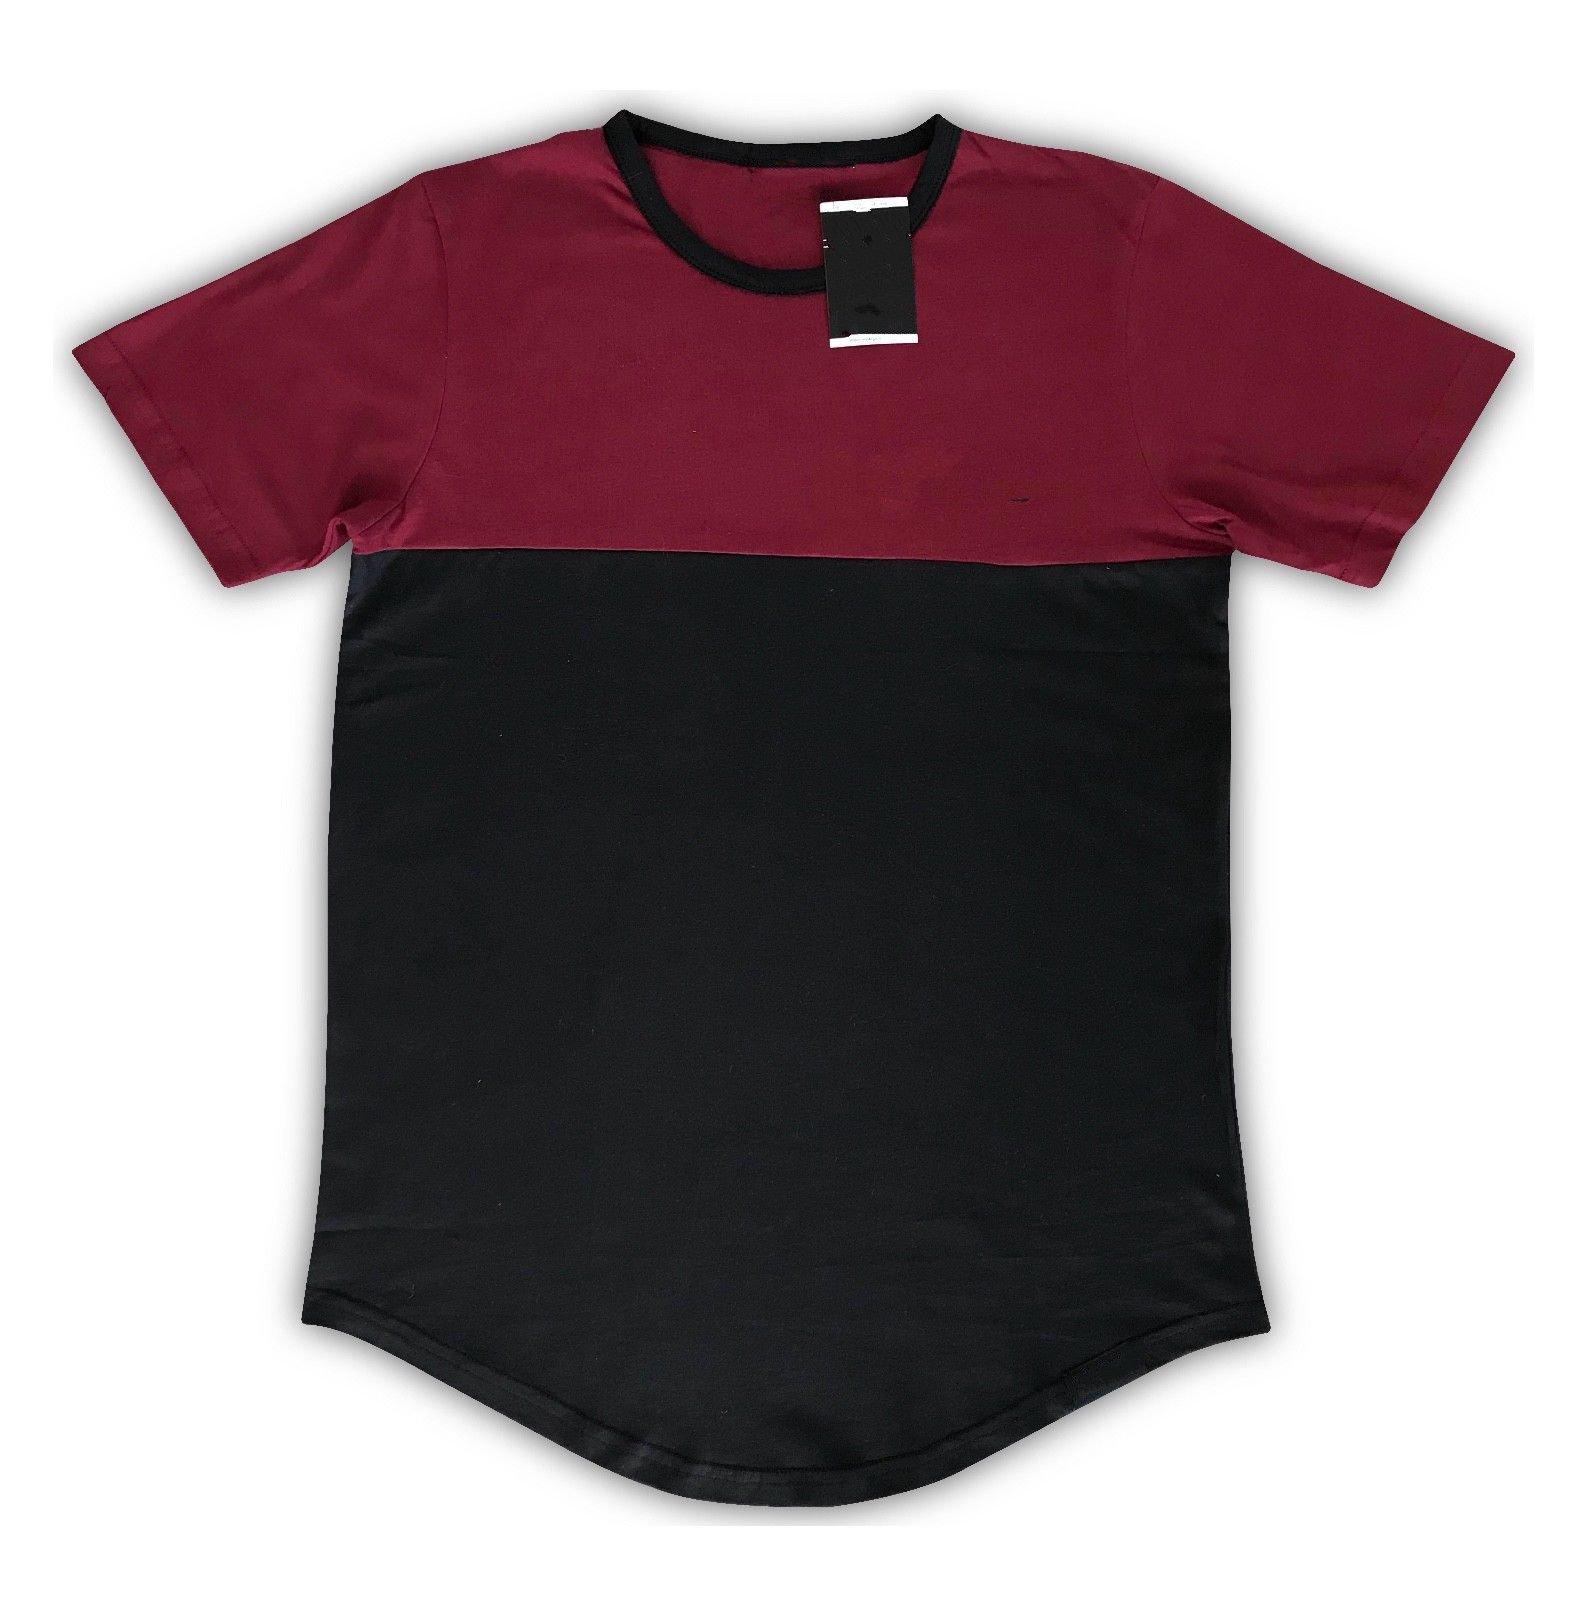 Skin color tight shirt